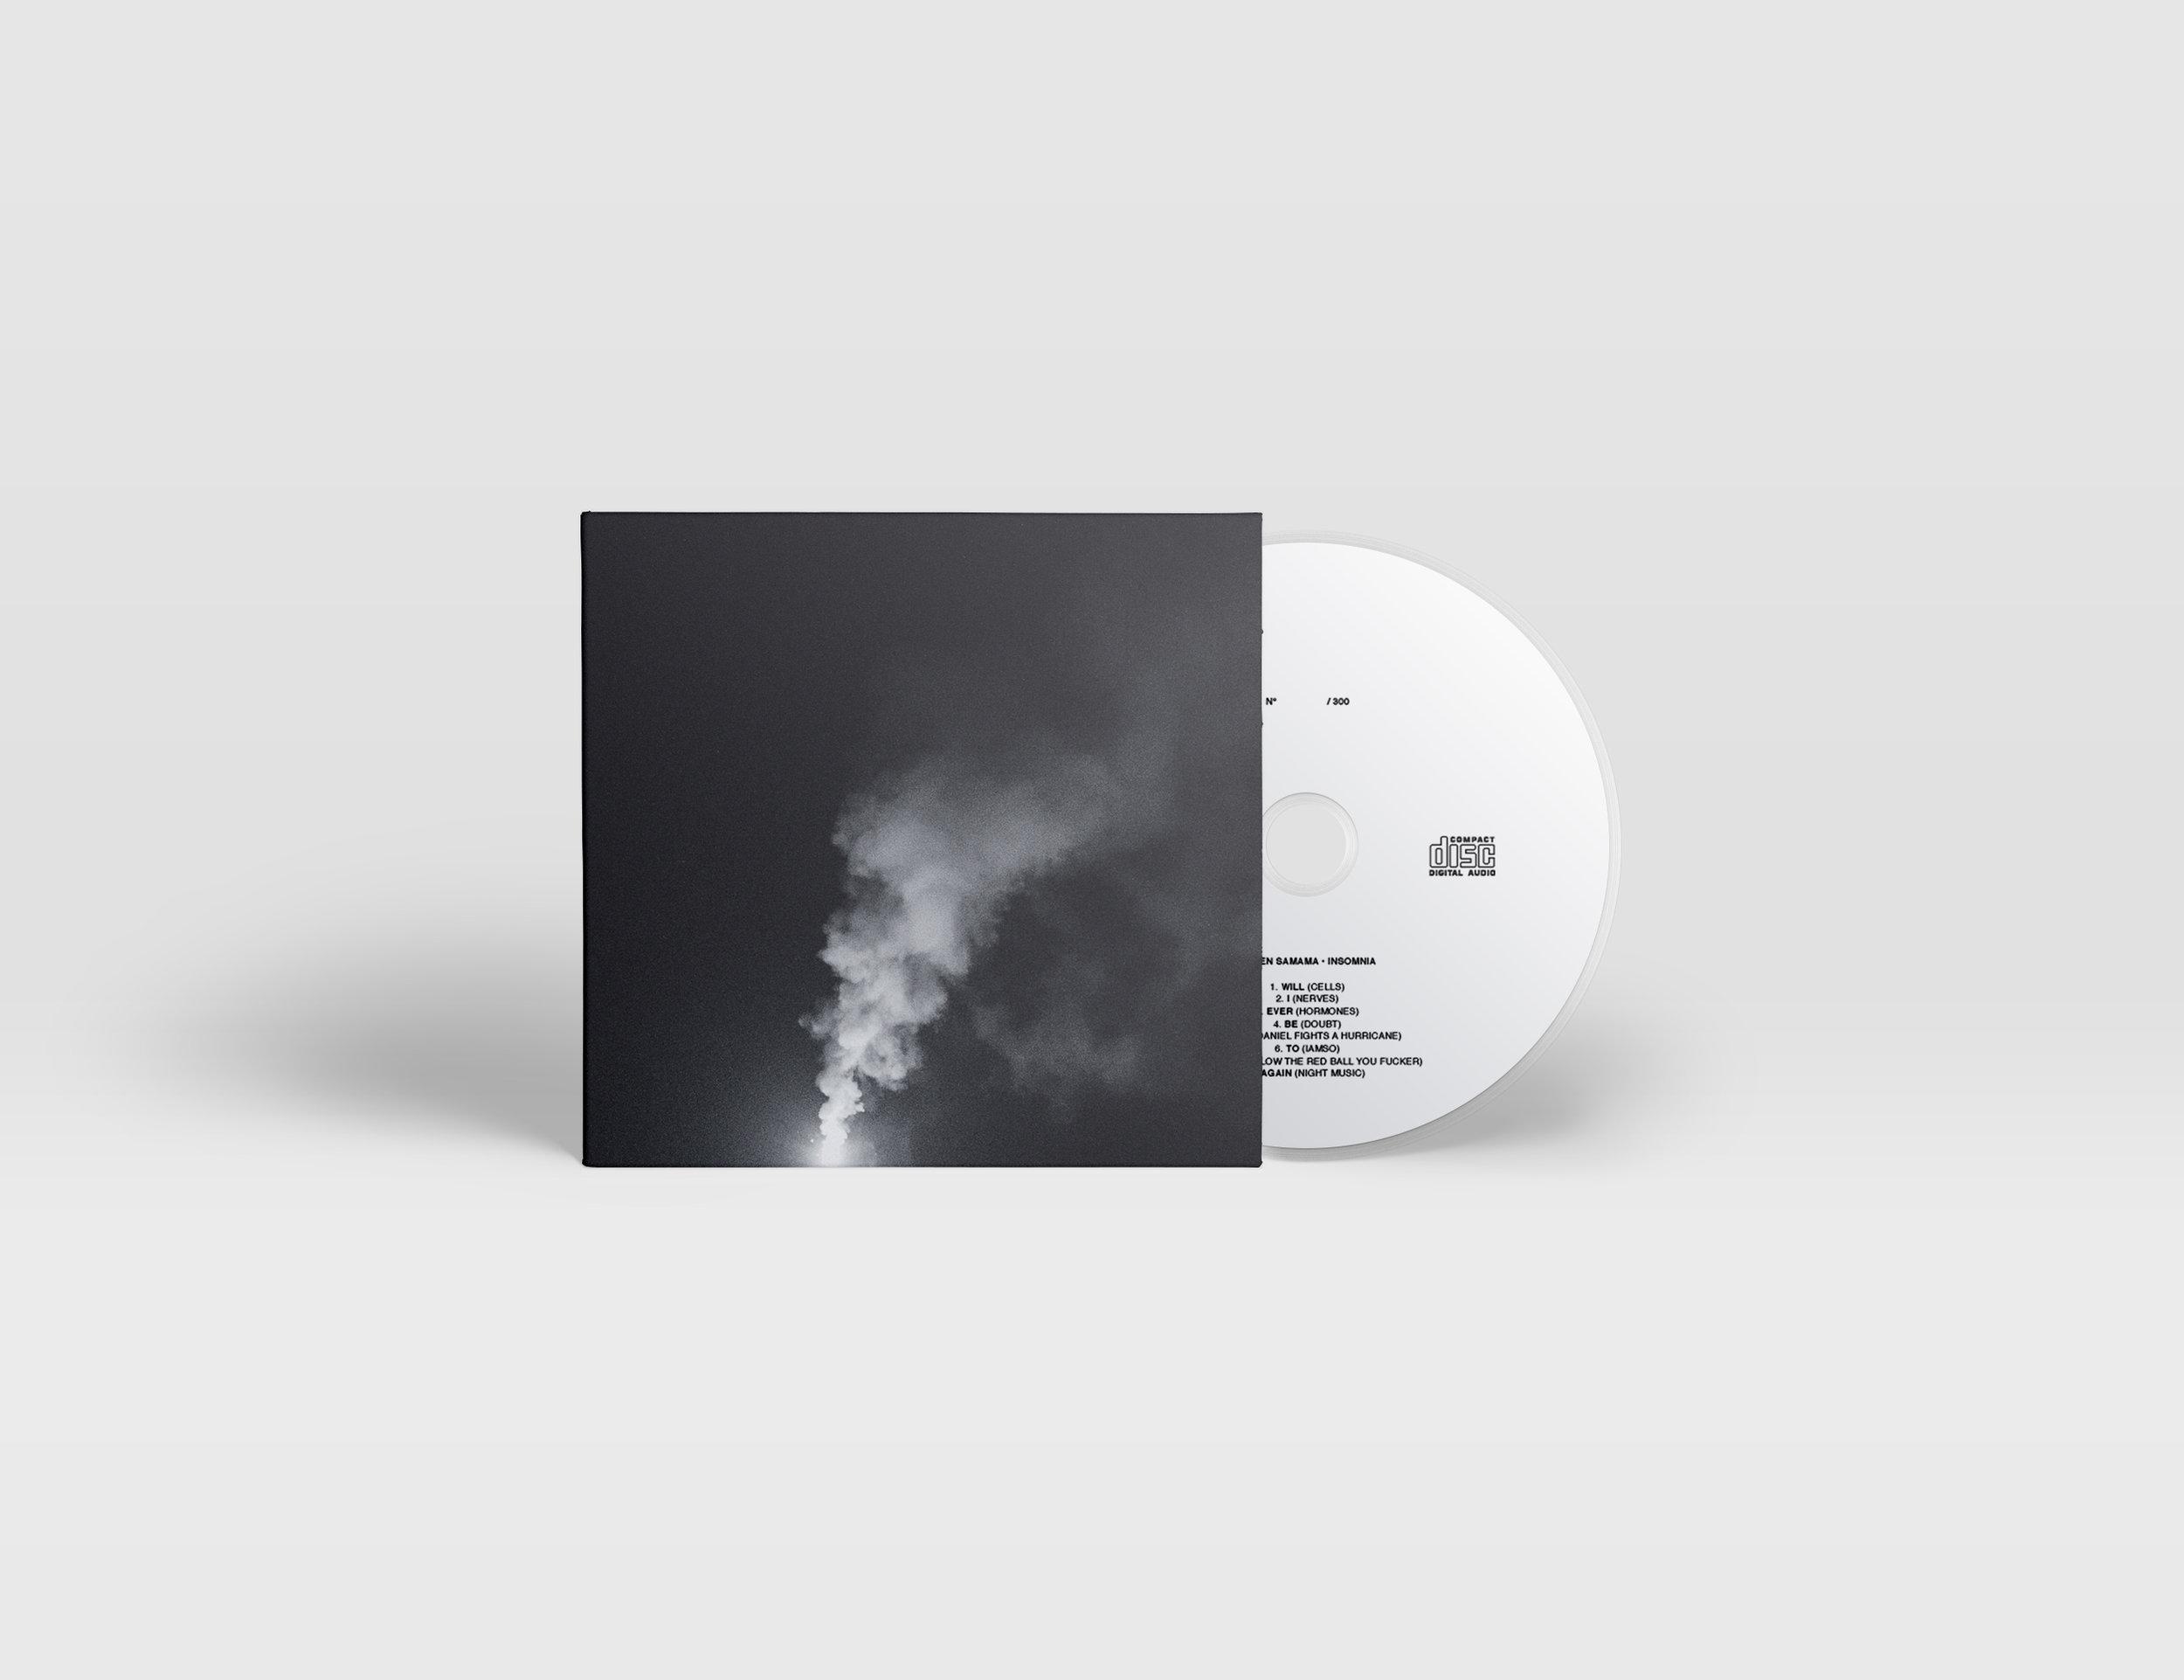 CD record